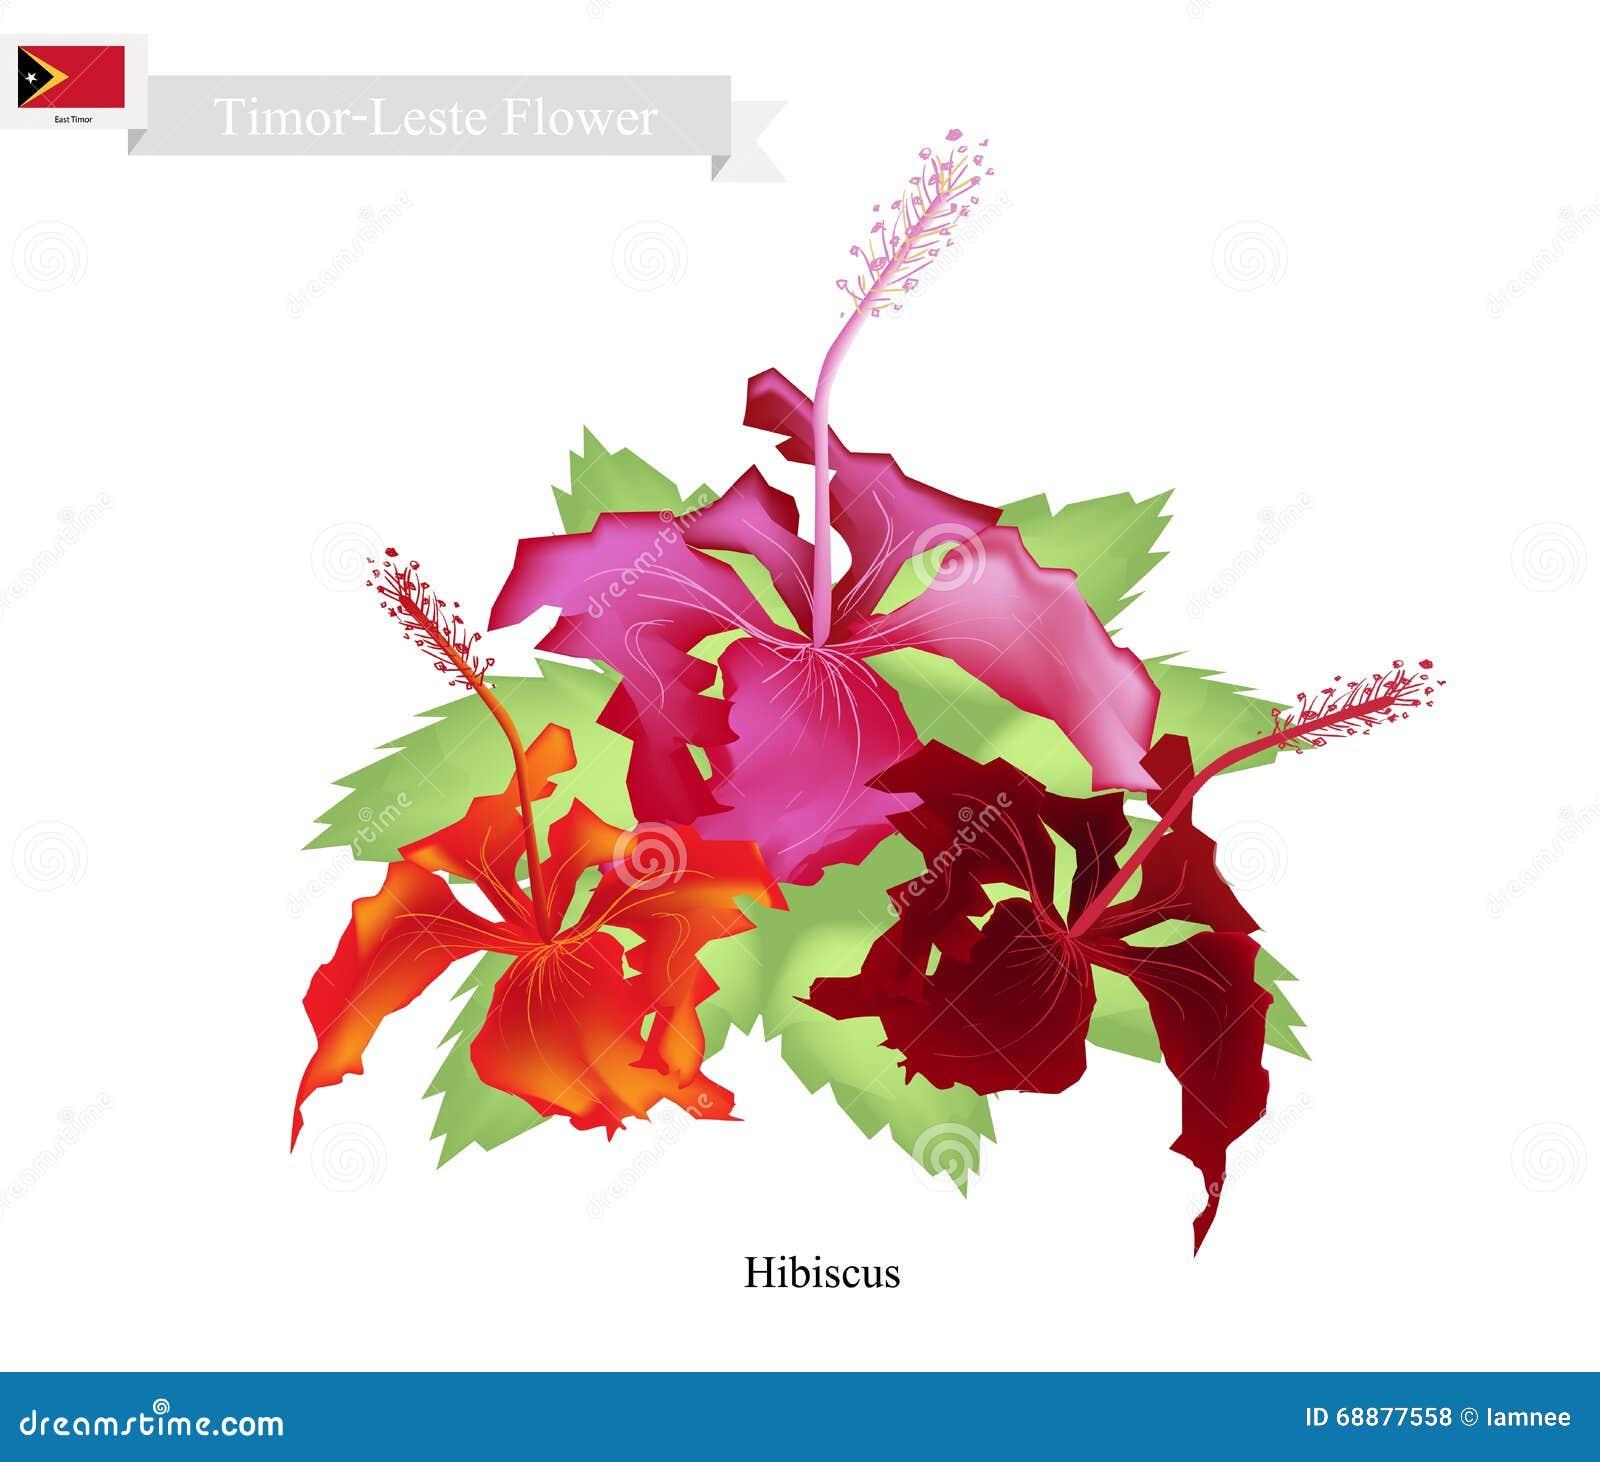 National flower of timor leste hibiscus flowers illustration national flower of timor leste hibiscus flowers izmirmasajfo